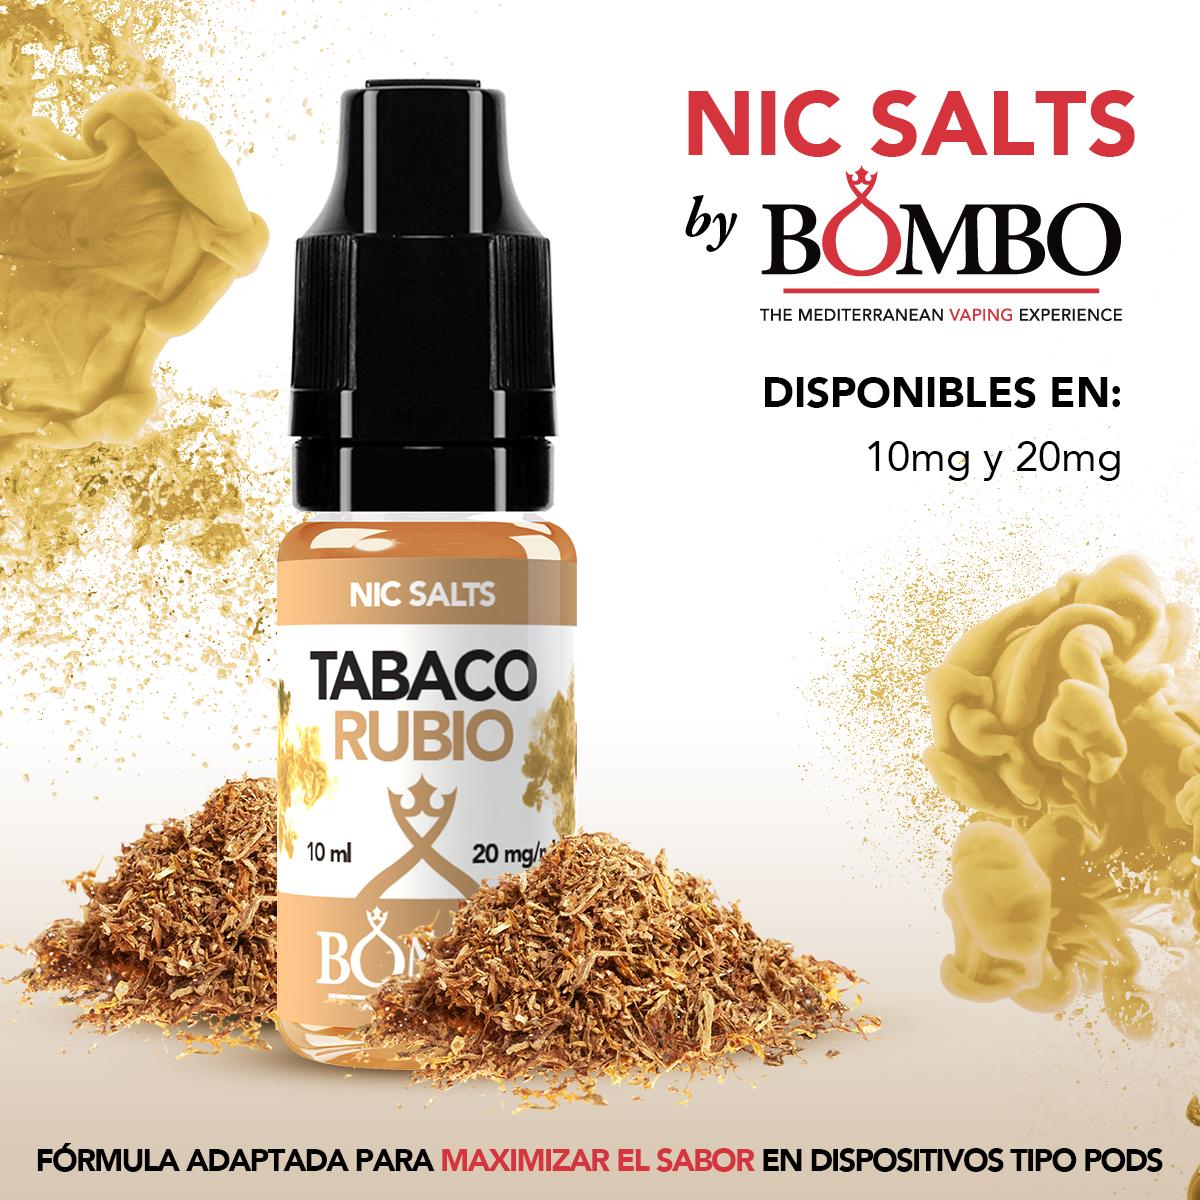 tabaco rubio bombo eliquids nic salts sales de nicotina